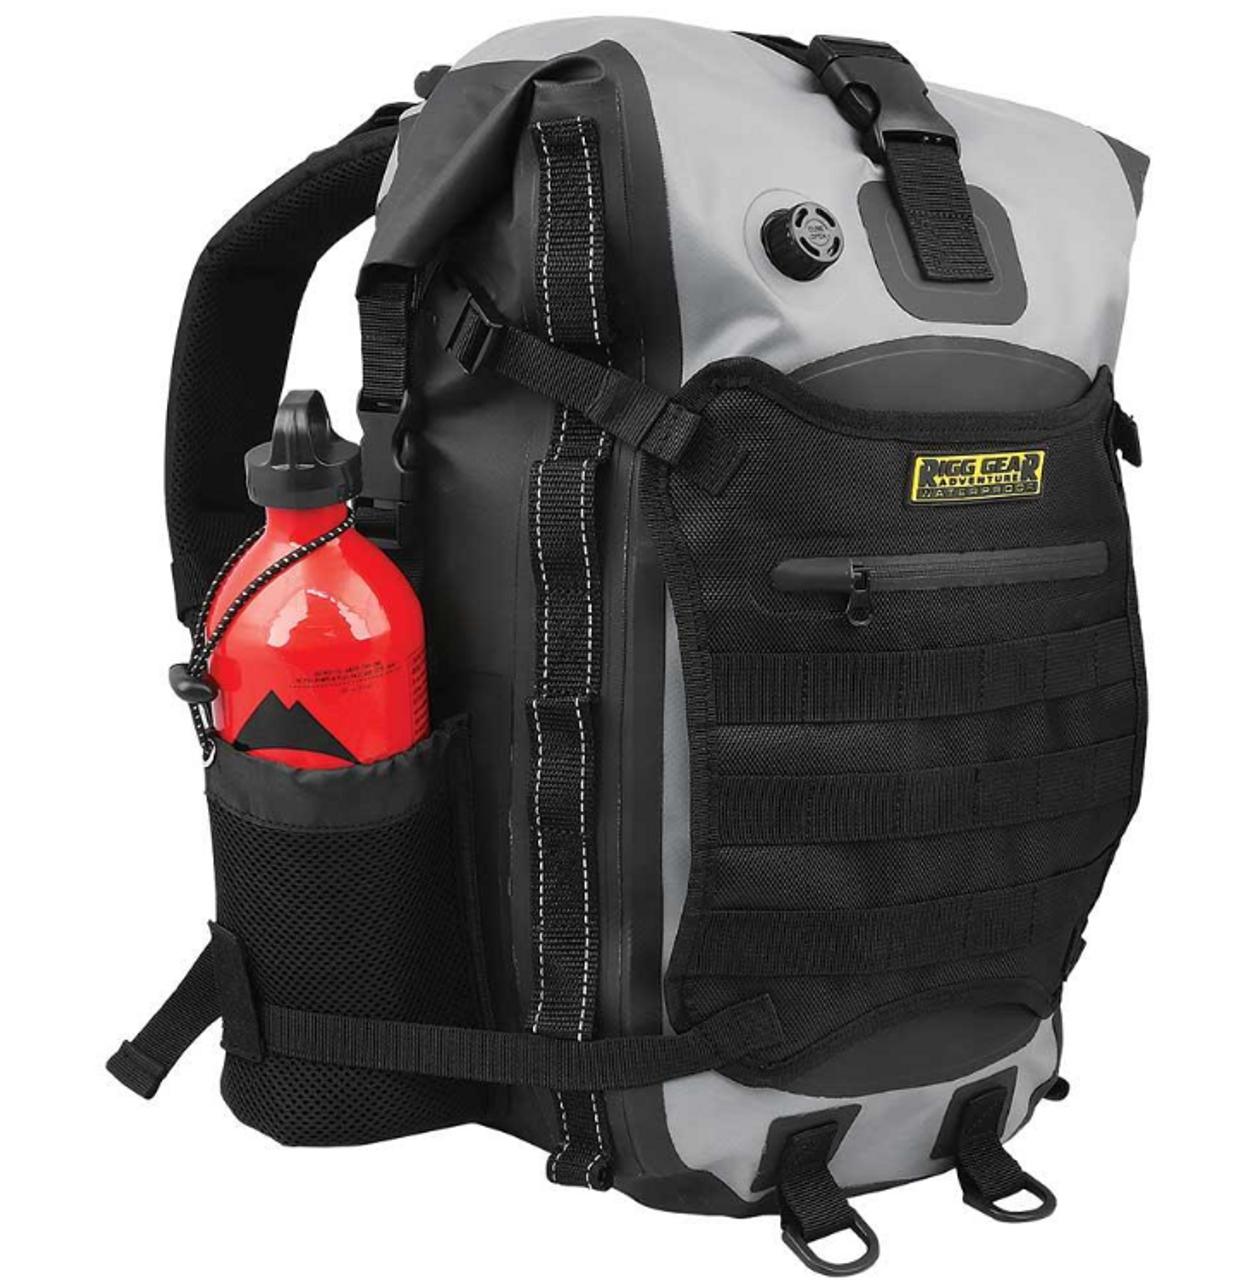 709de86218 Nelson-Rig+Backpack+SE-3020+Hurricane+Black+luggage